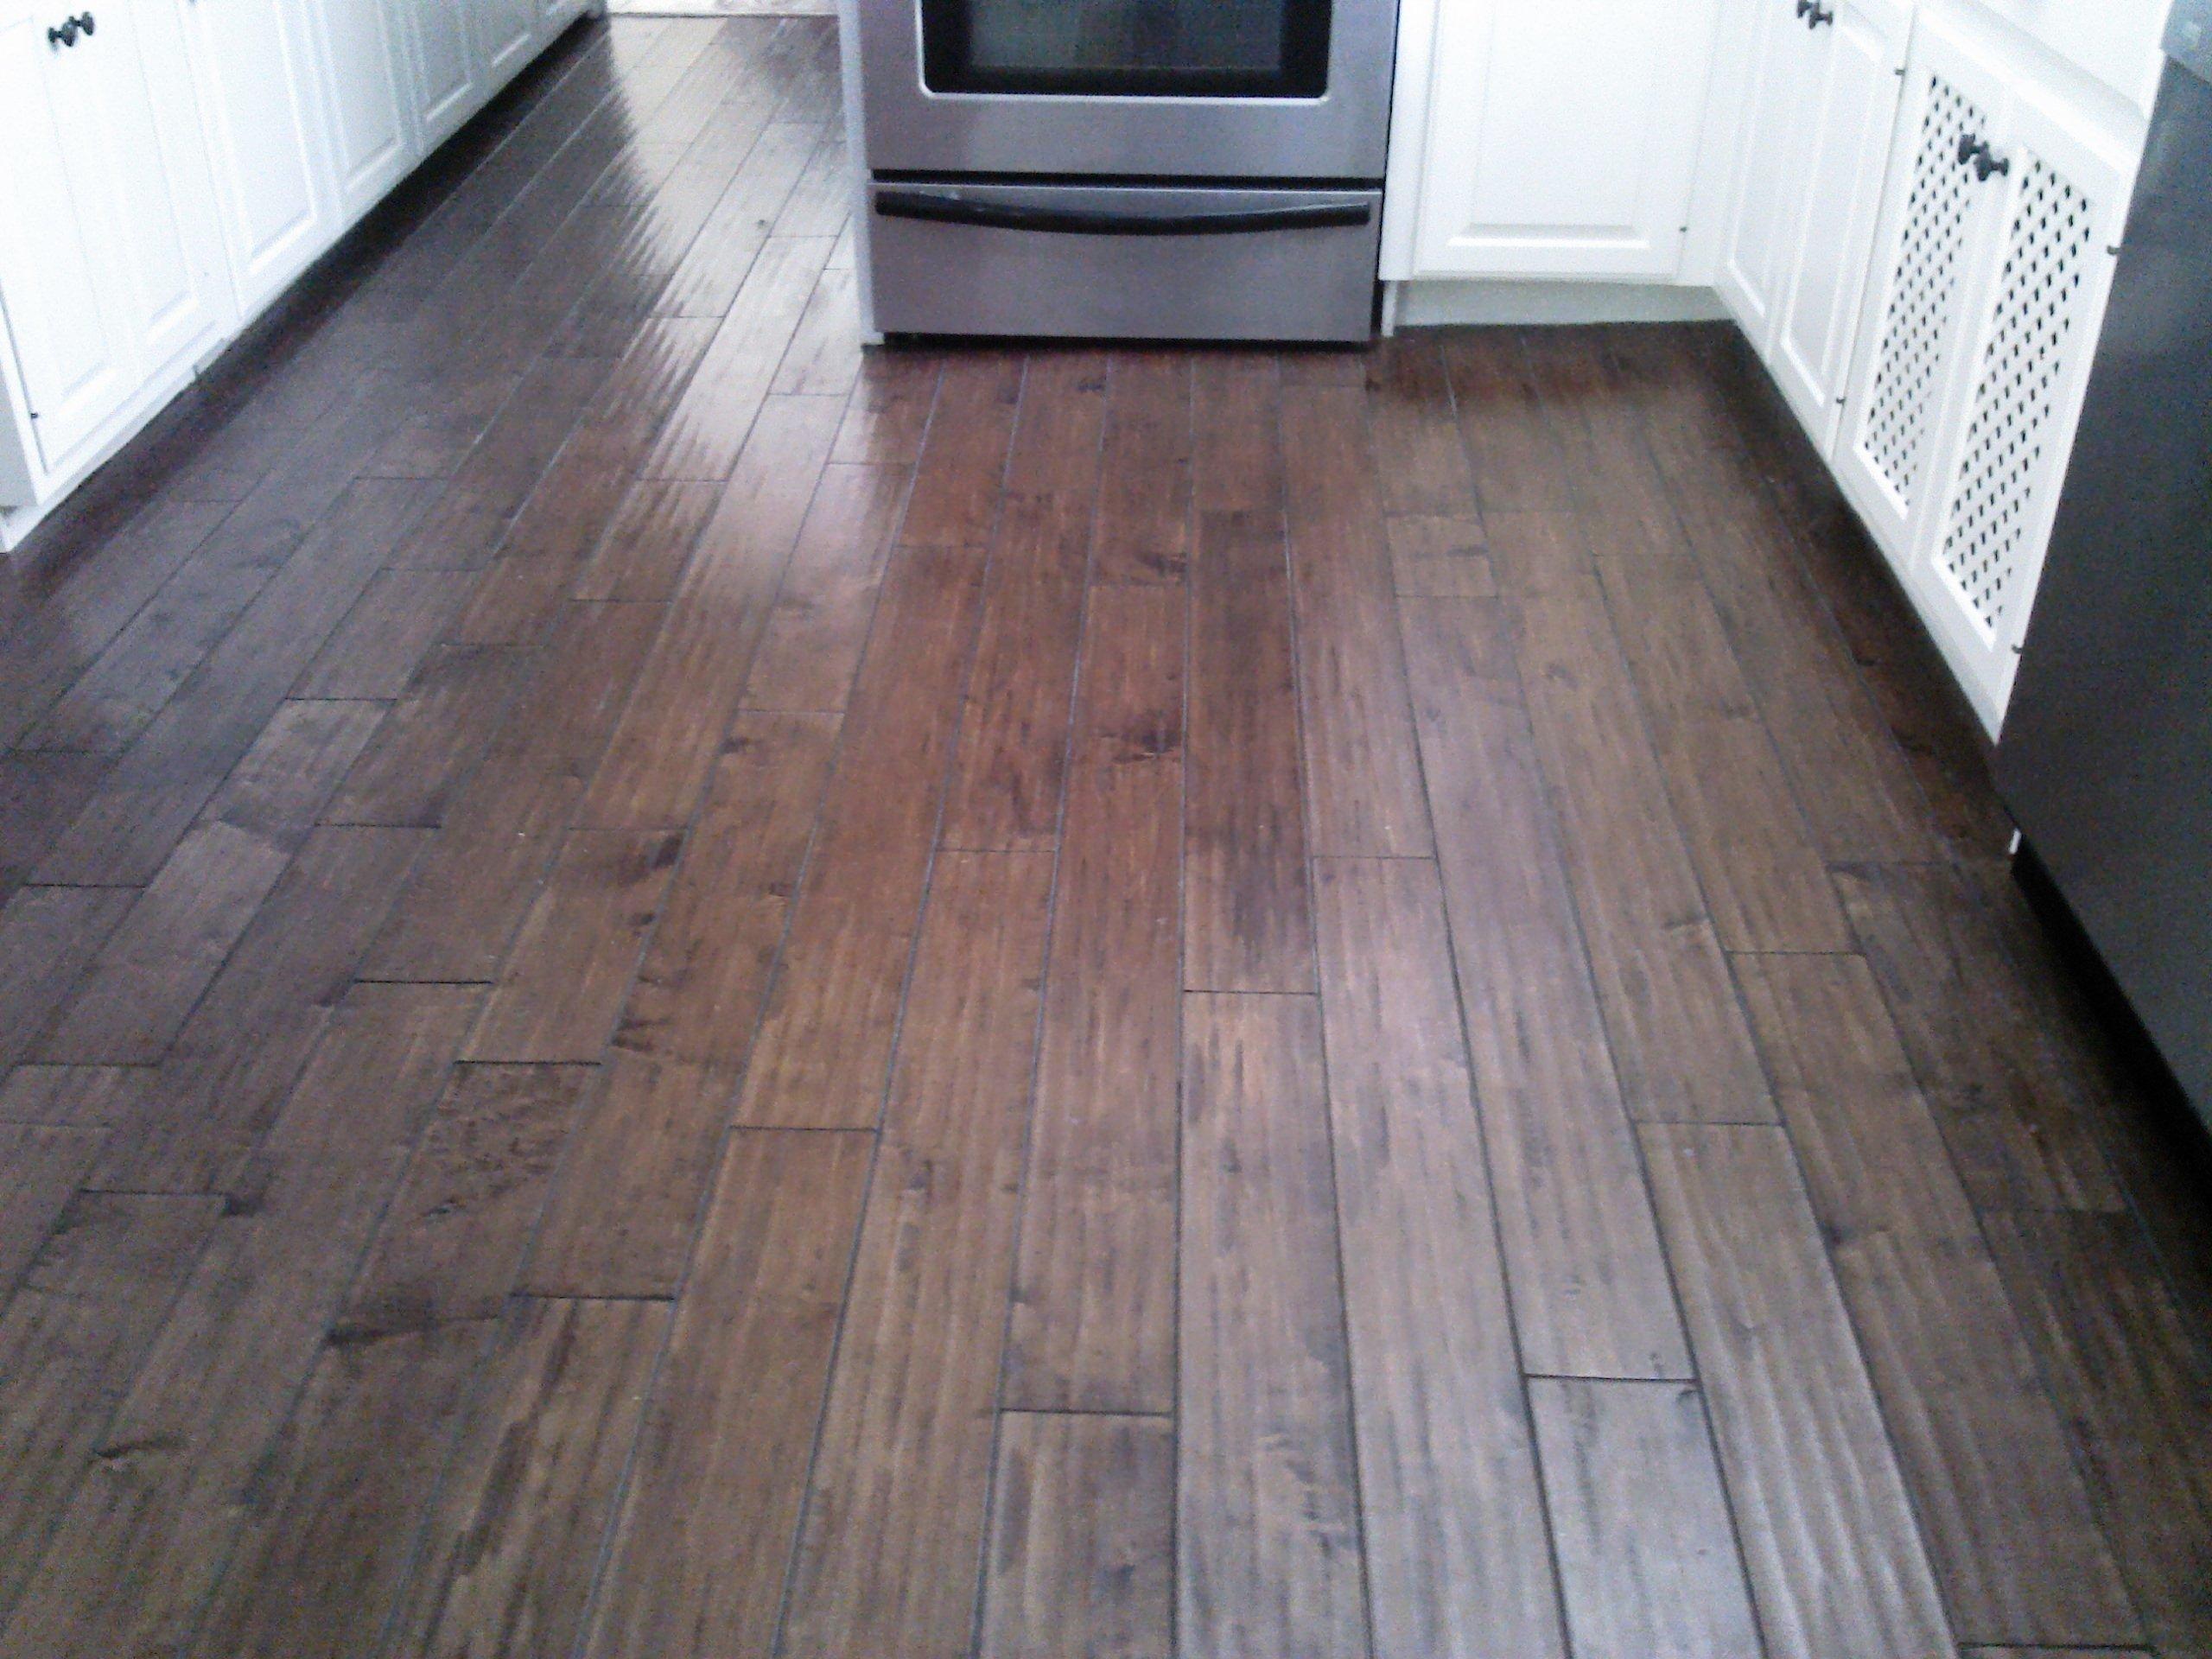 Laminate Wood Flooring In Kitchen Ratings Reviews